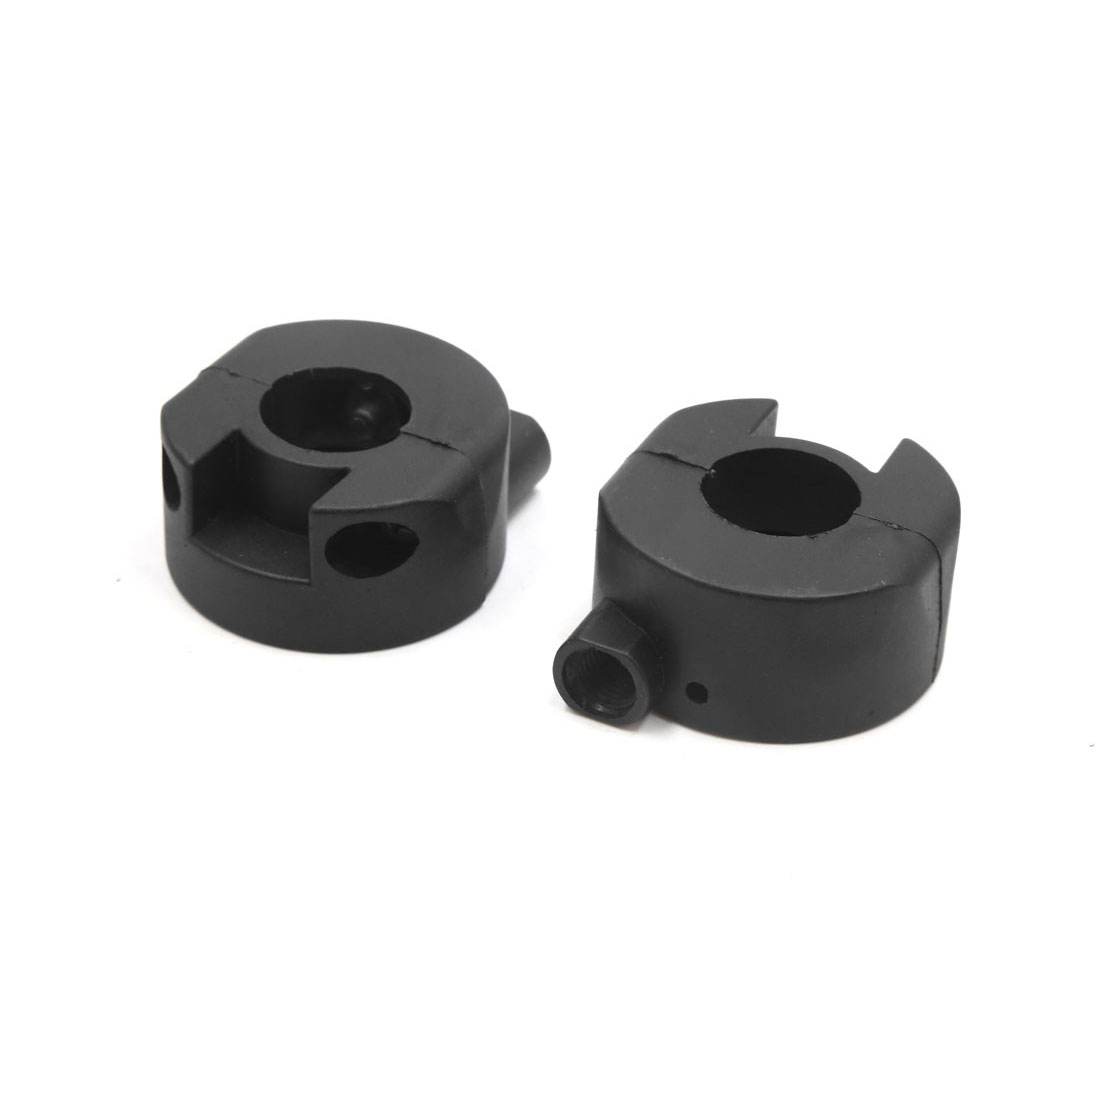 4Pcs Plastic Handlebar Throttle Cable Bracket Holder for Princess 125 100 - image 1 de 2